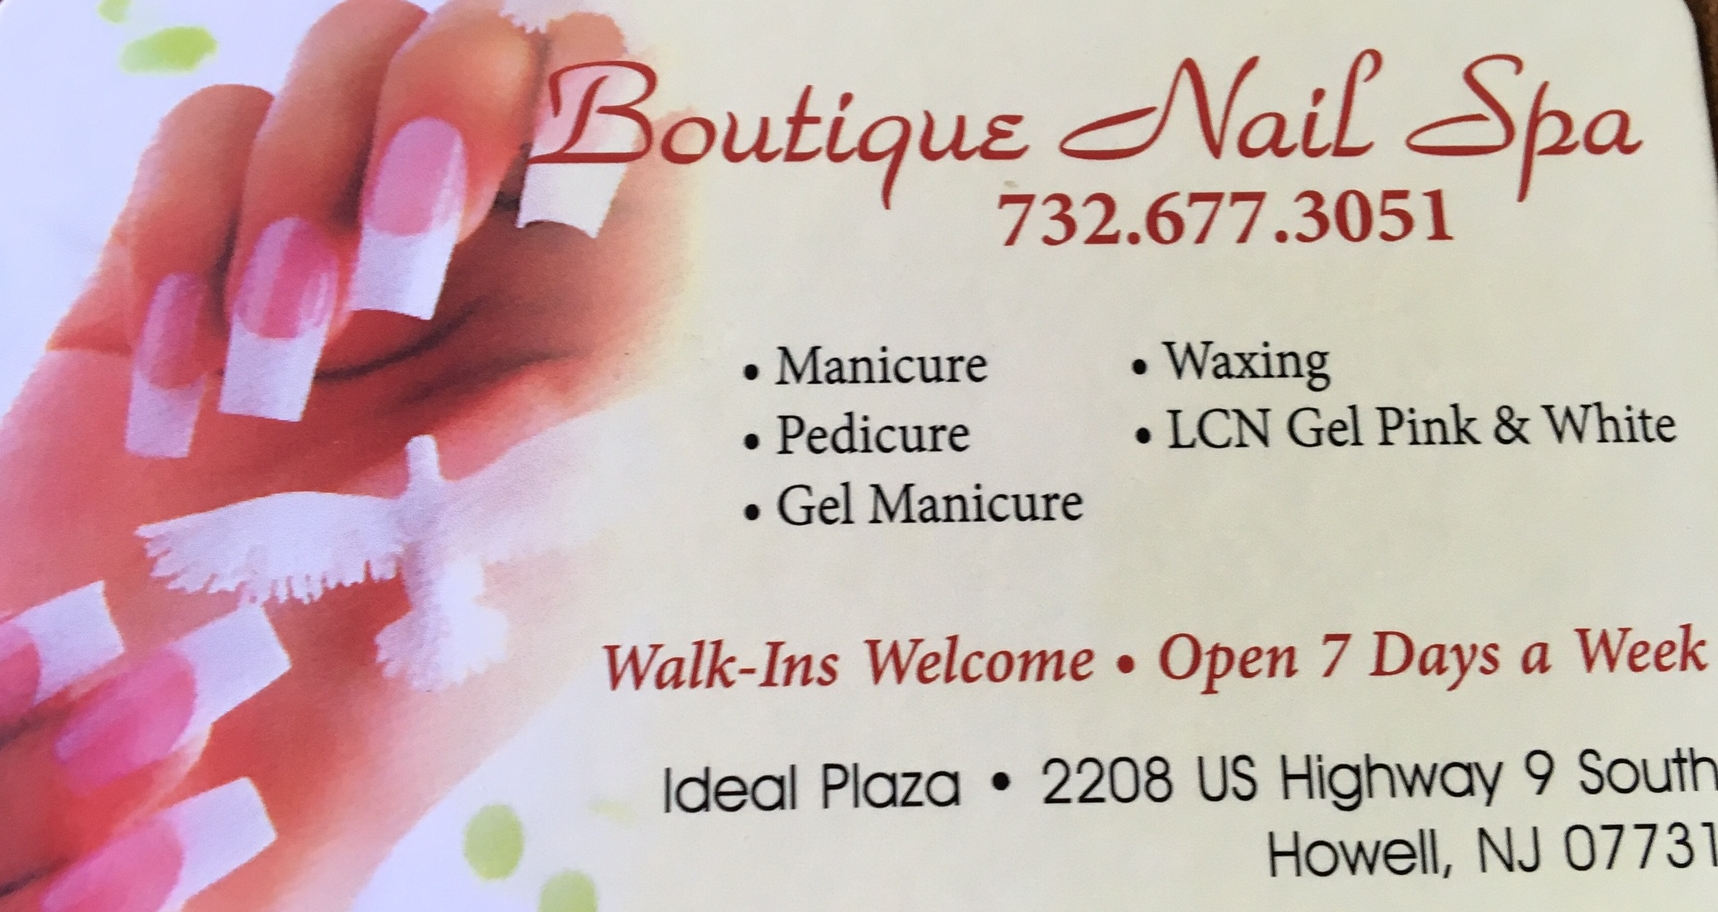 Boutique Nail